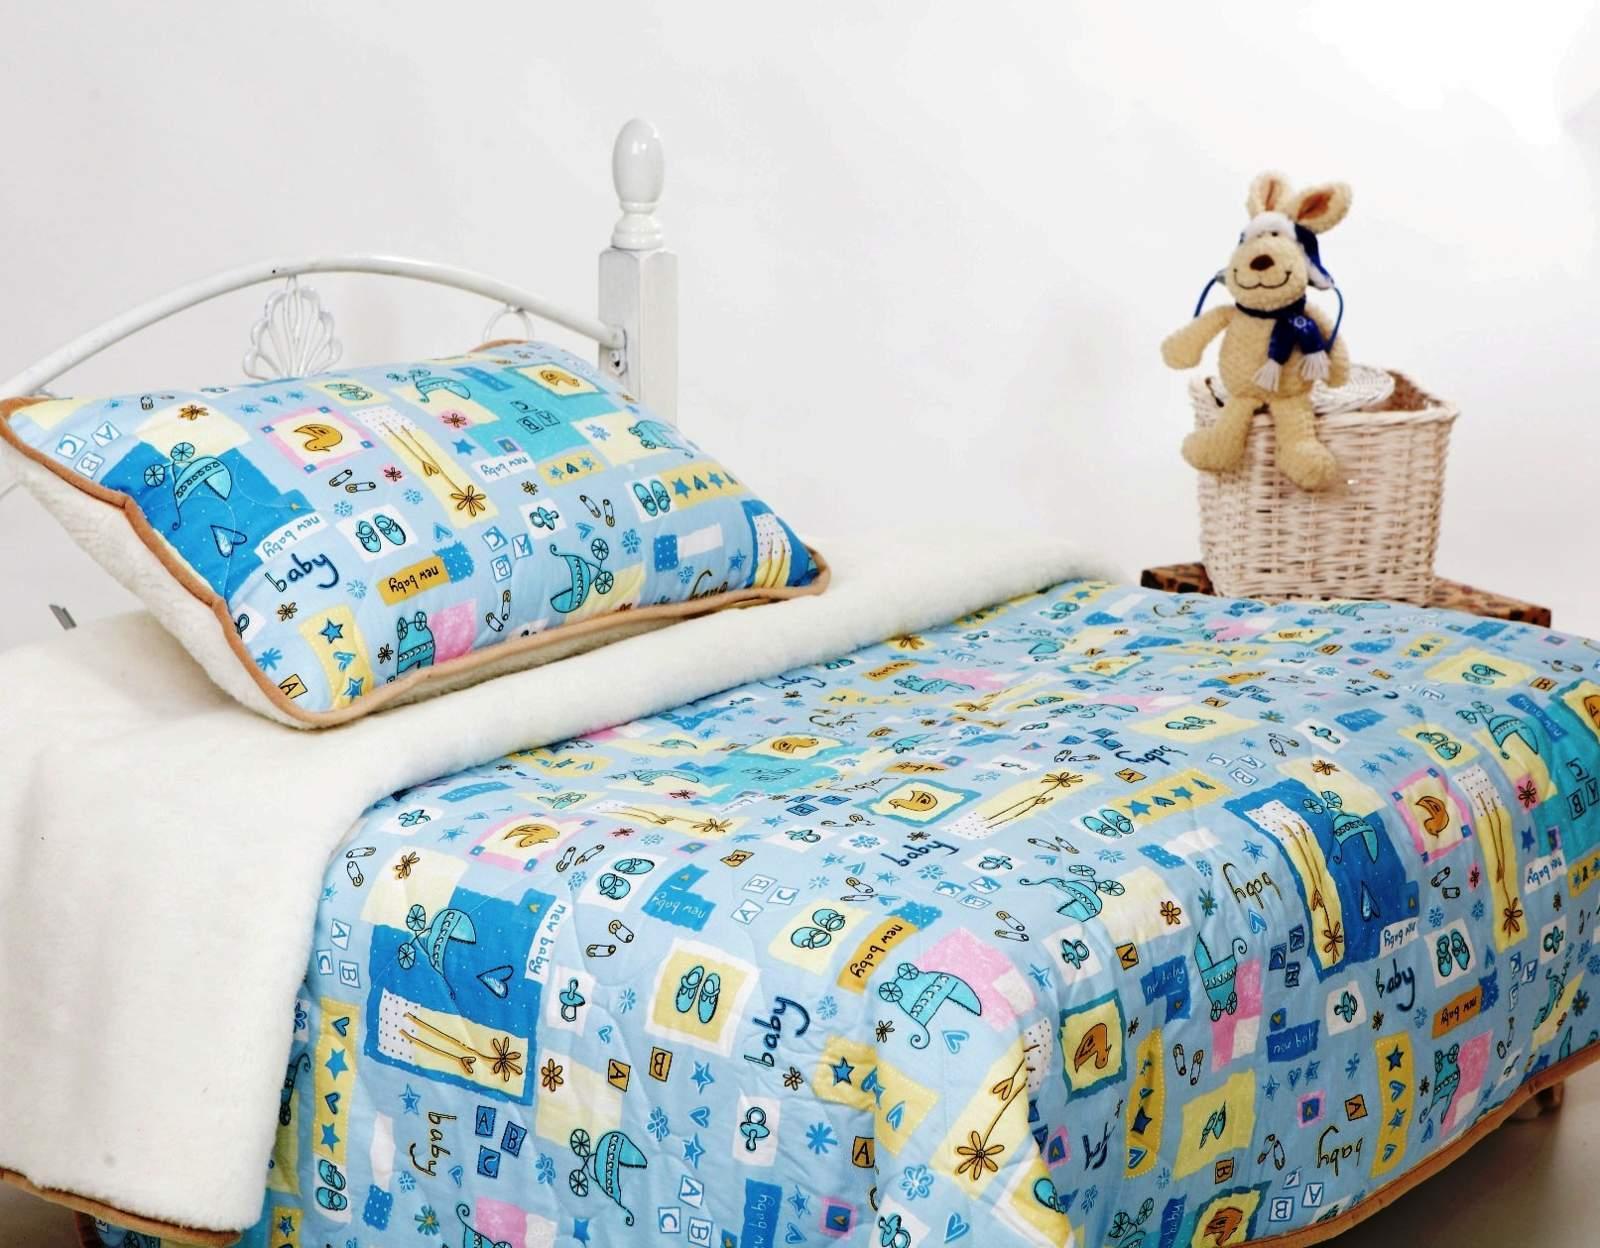 Балдахин в детскую кроватку нужен ли